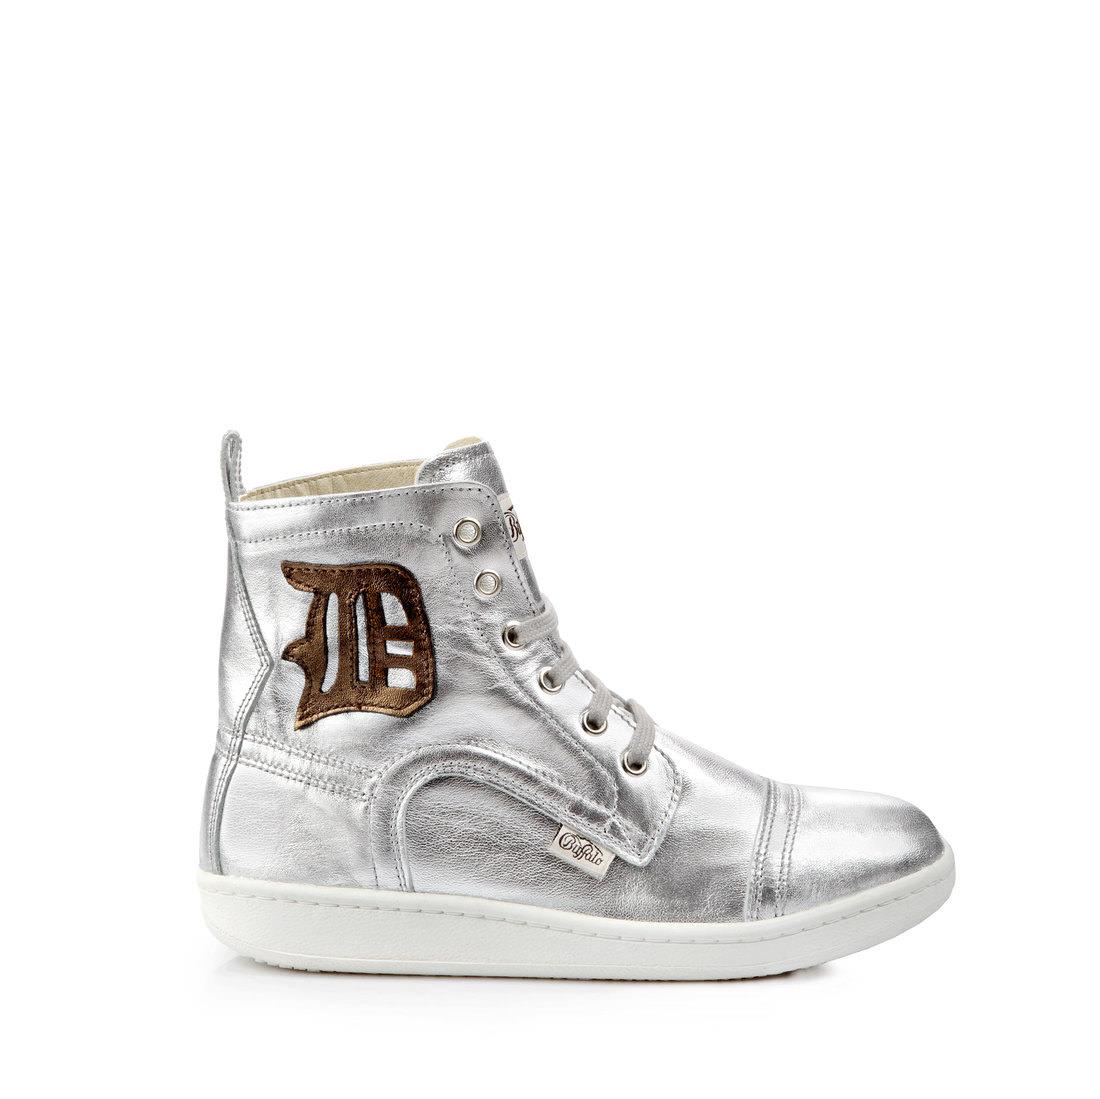 03e5a812fa11 Buffalo high-top sneaker leather silver buy online in BUFFALO Online ...